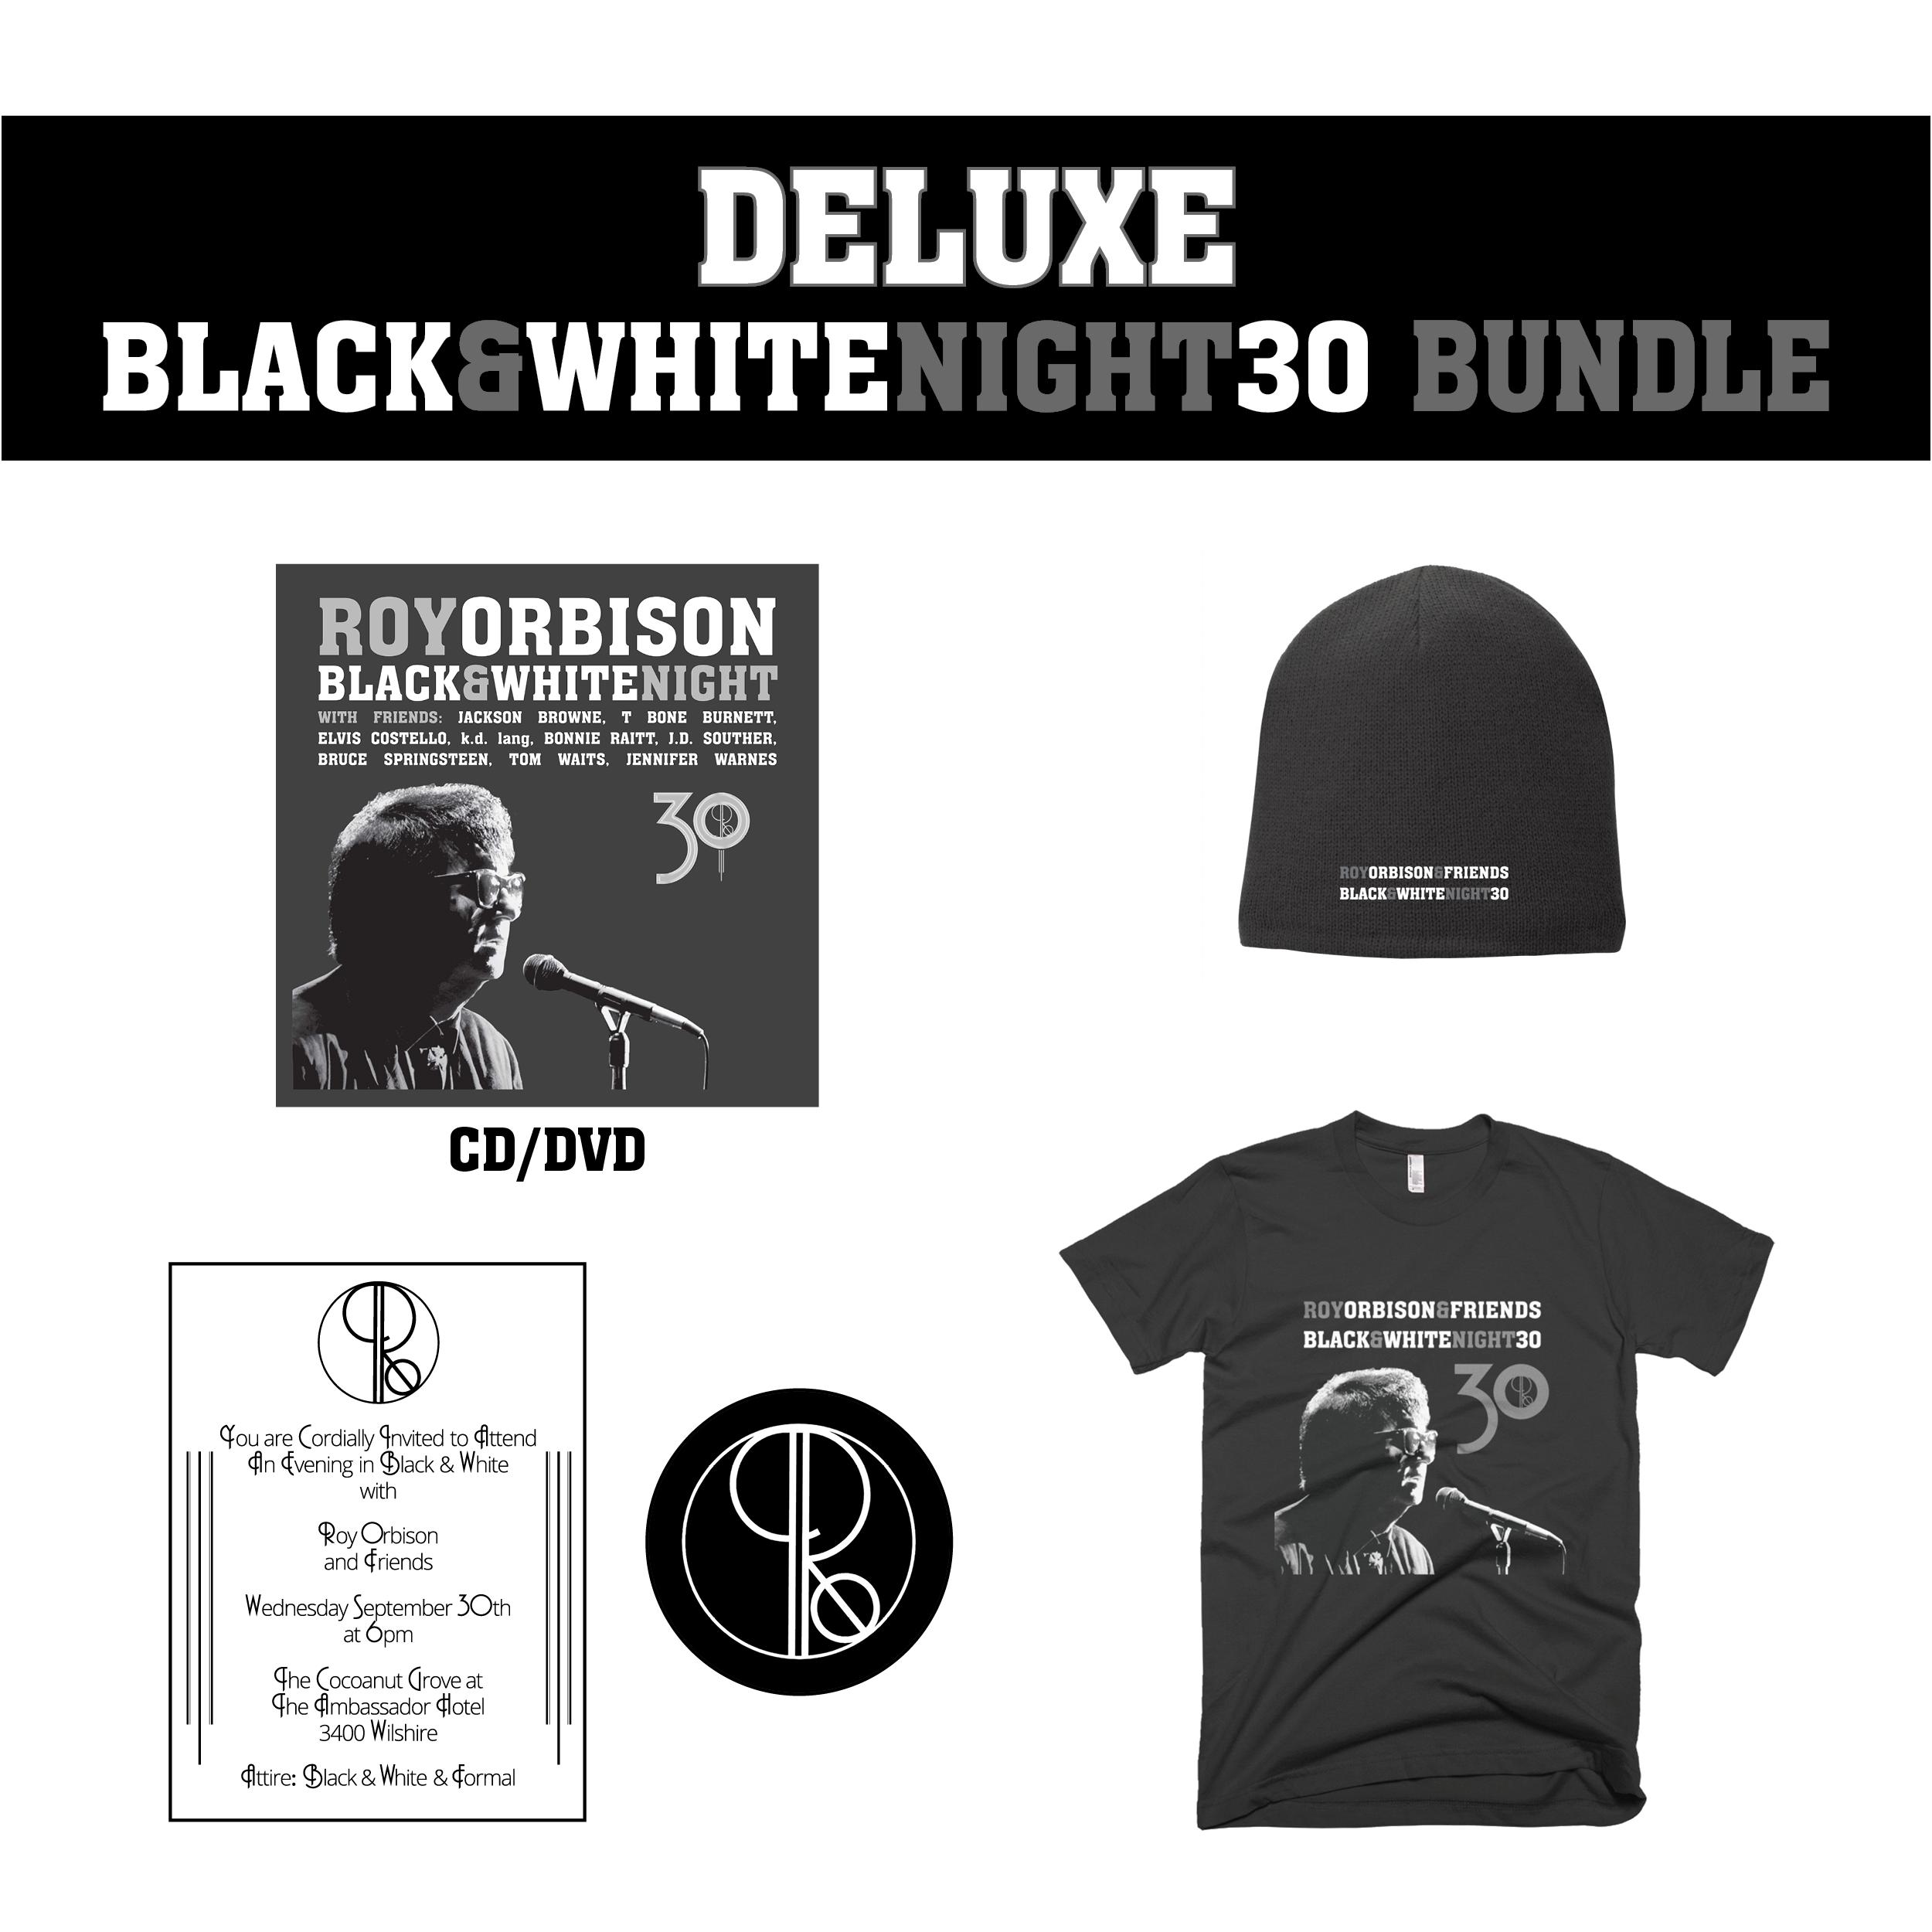 Deluxe black white night 30 cd dvd bundle